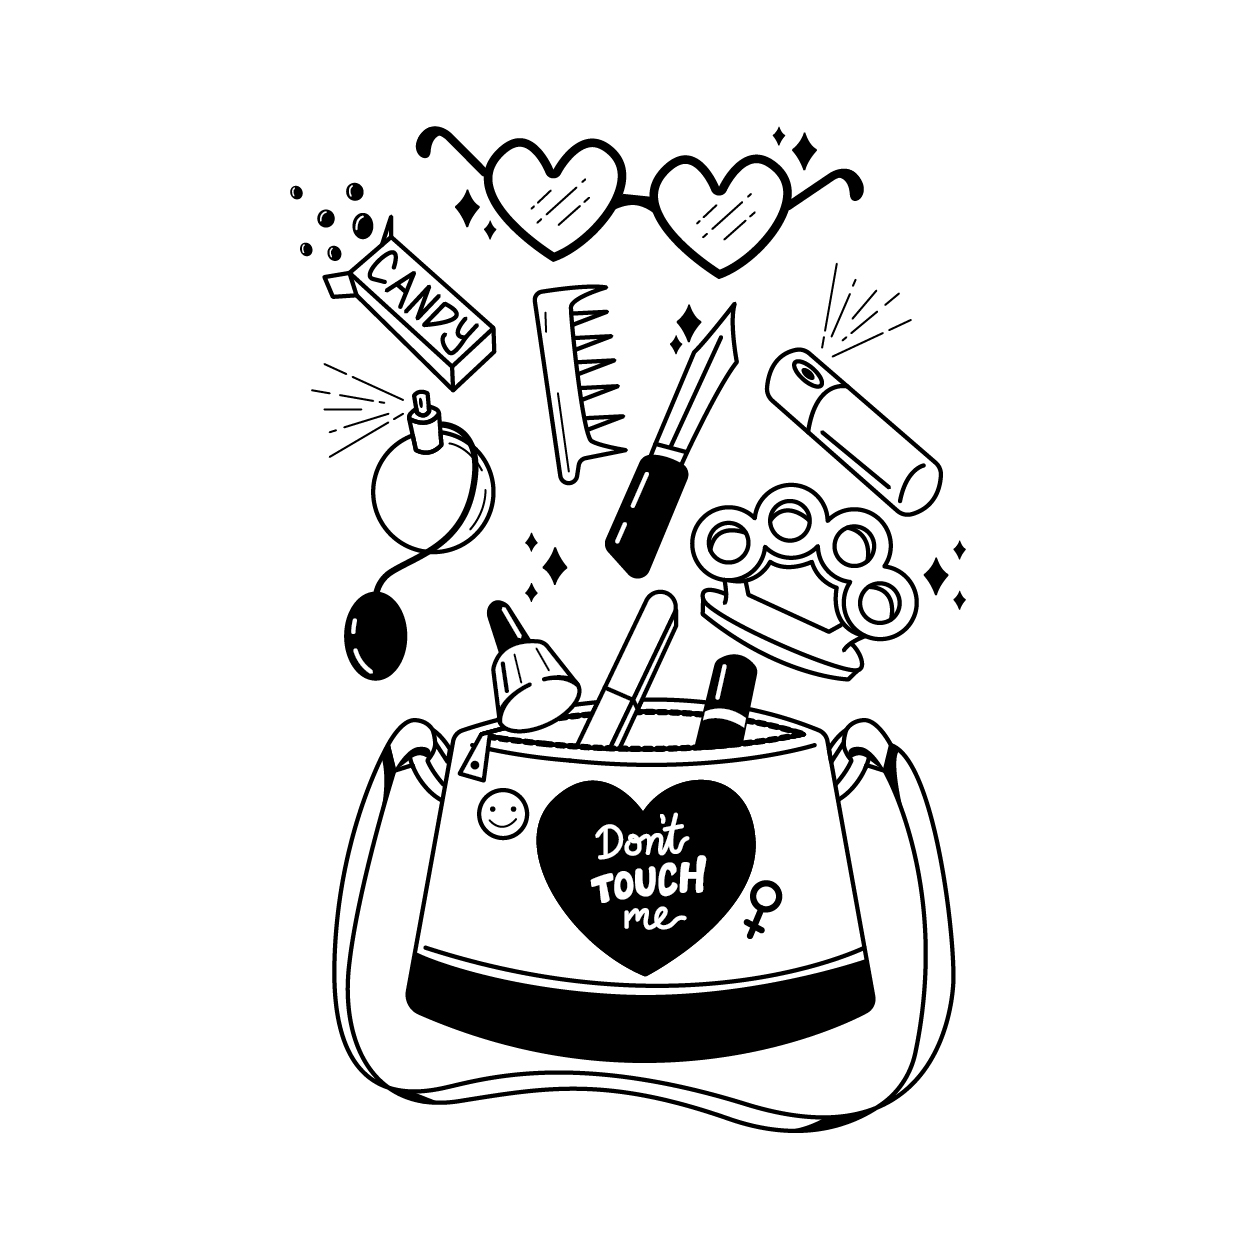 Leave your mark - Emiliani - illustrations-03.jpg